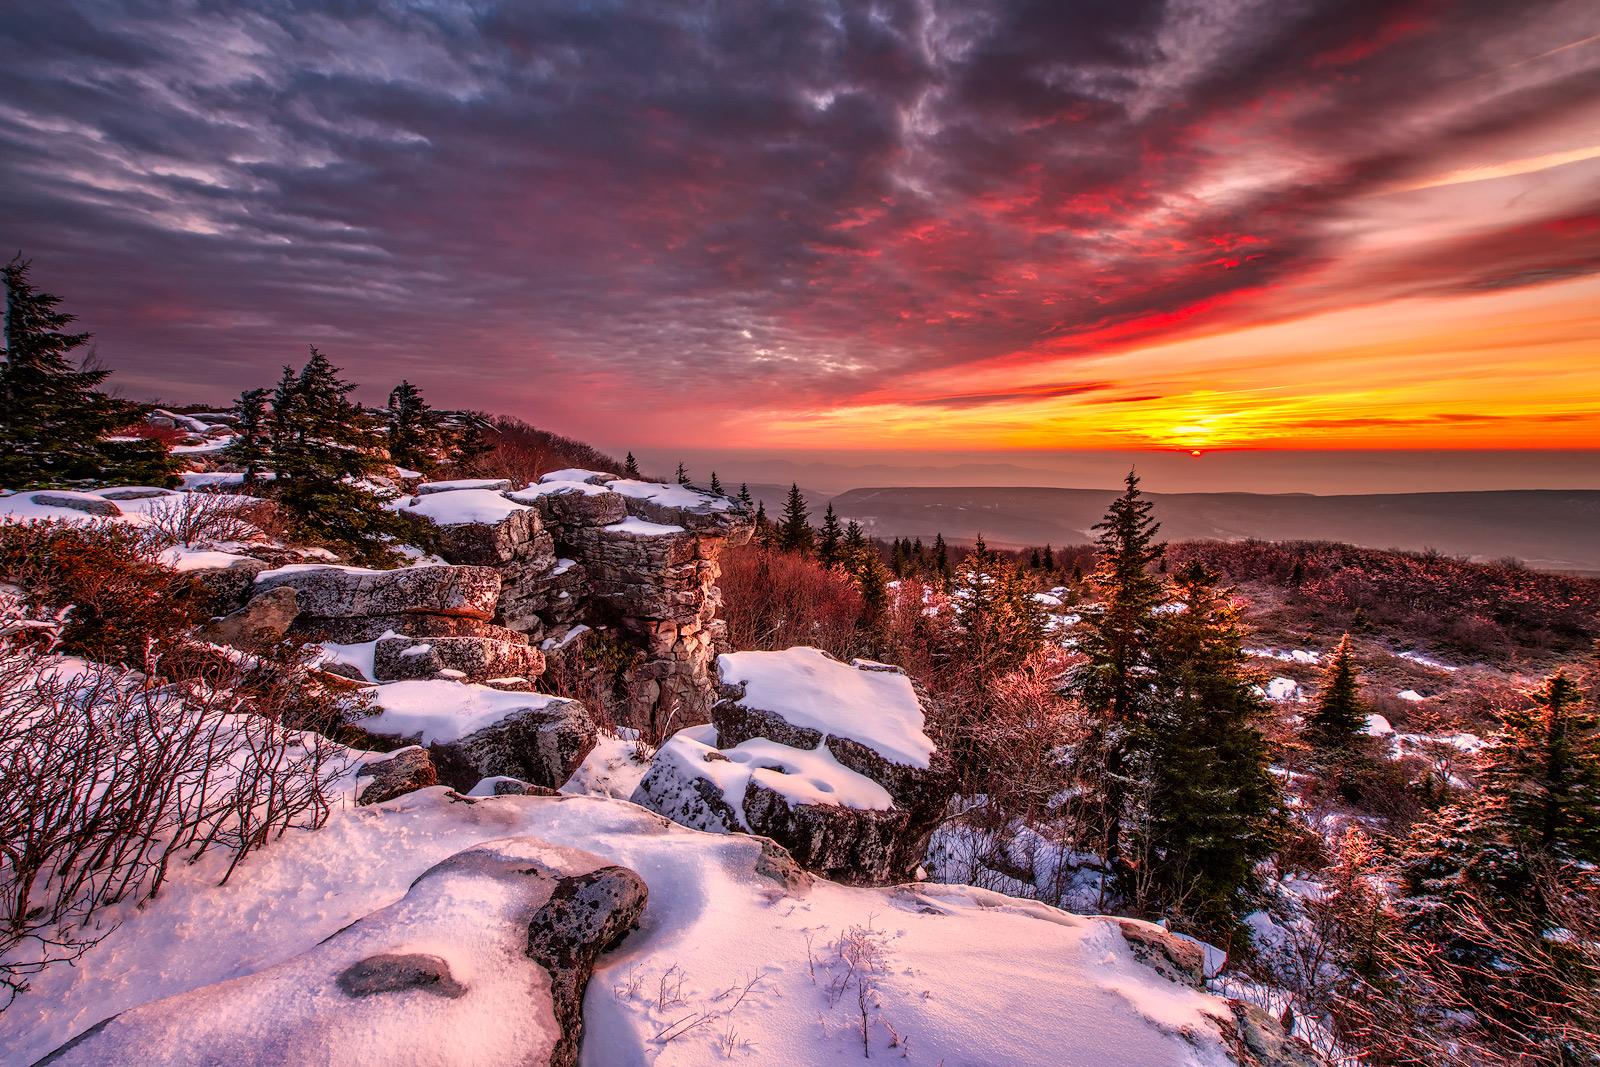 West Virginia, Bear Rocks, Dolly Sods Wilderness, Canaan Valley, Hemlock, Mountain Laurel, Dolly Sods, Allegheny Mountains, Bear Rocks Preserve, Monongahela National Forest, Foggy Morning, Fog, Sun, photo